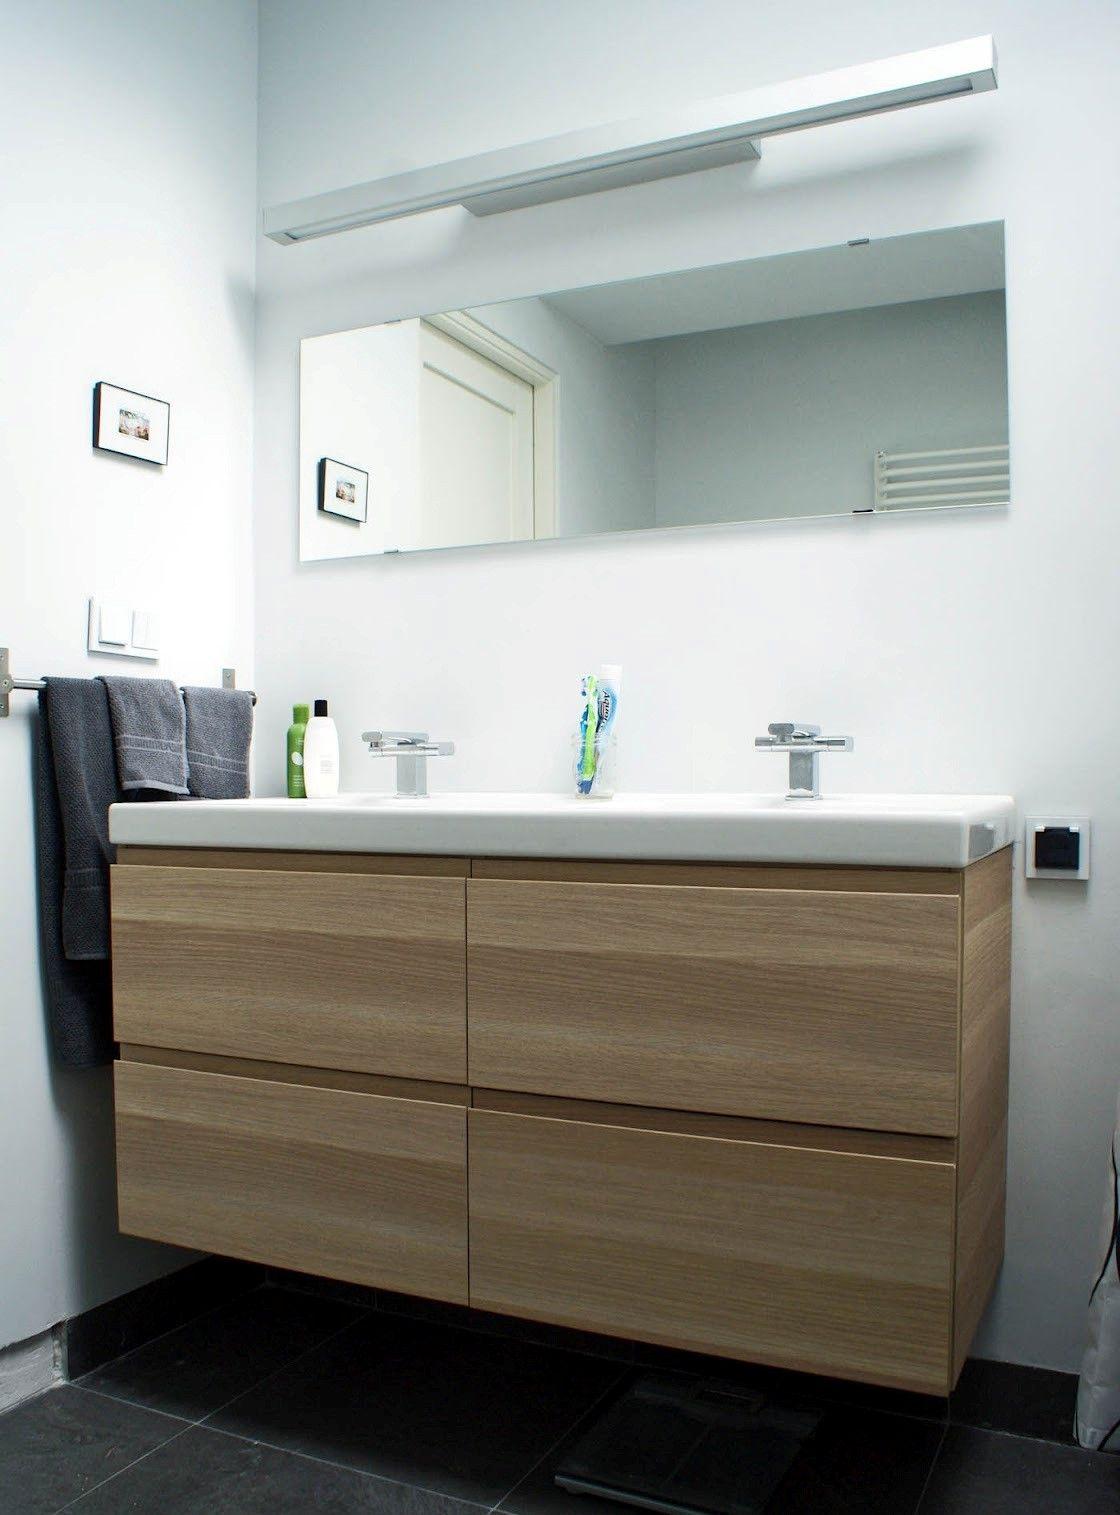 99+ ikea bathroom cabinets and vanities - kitchen cabinets storage